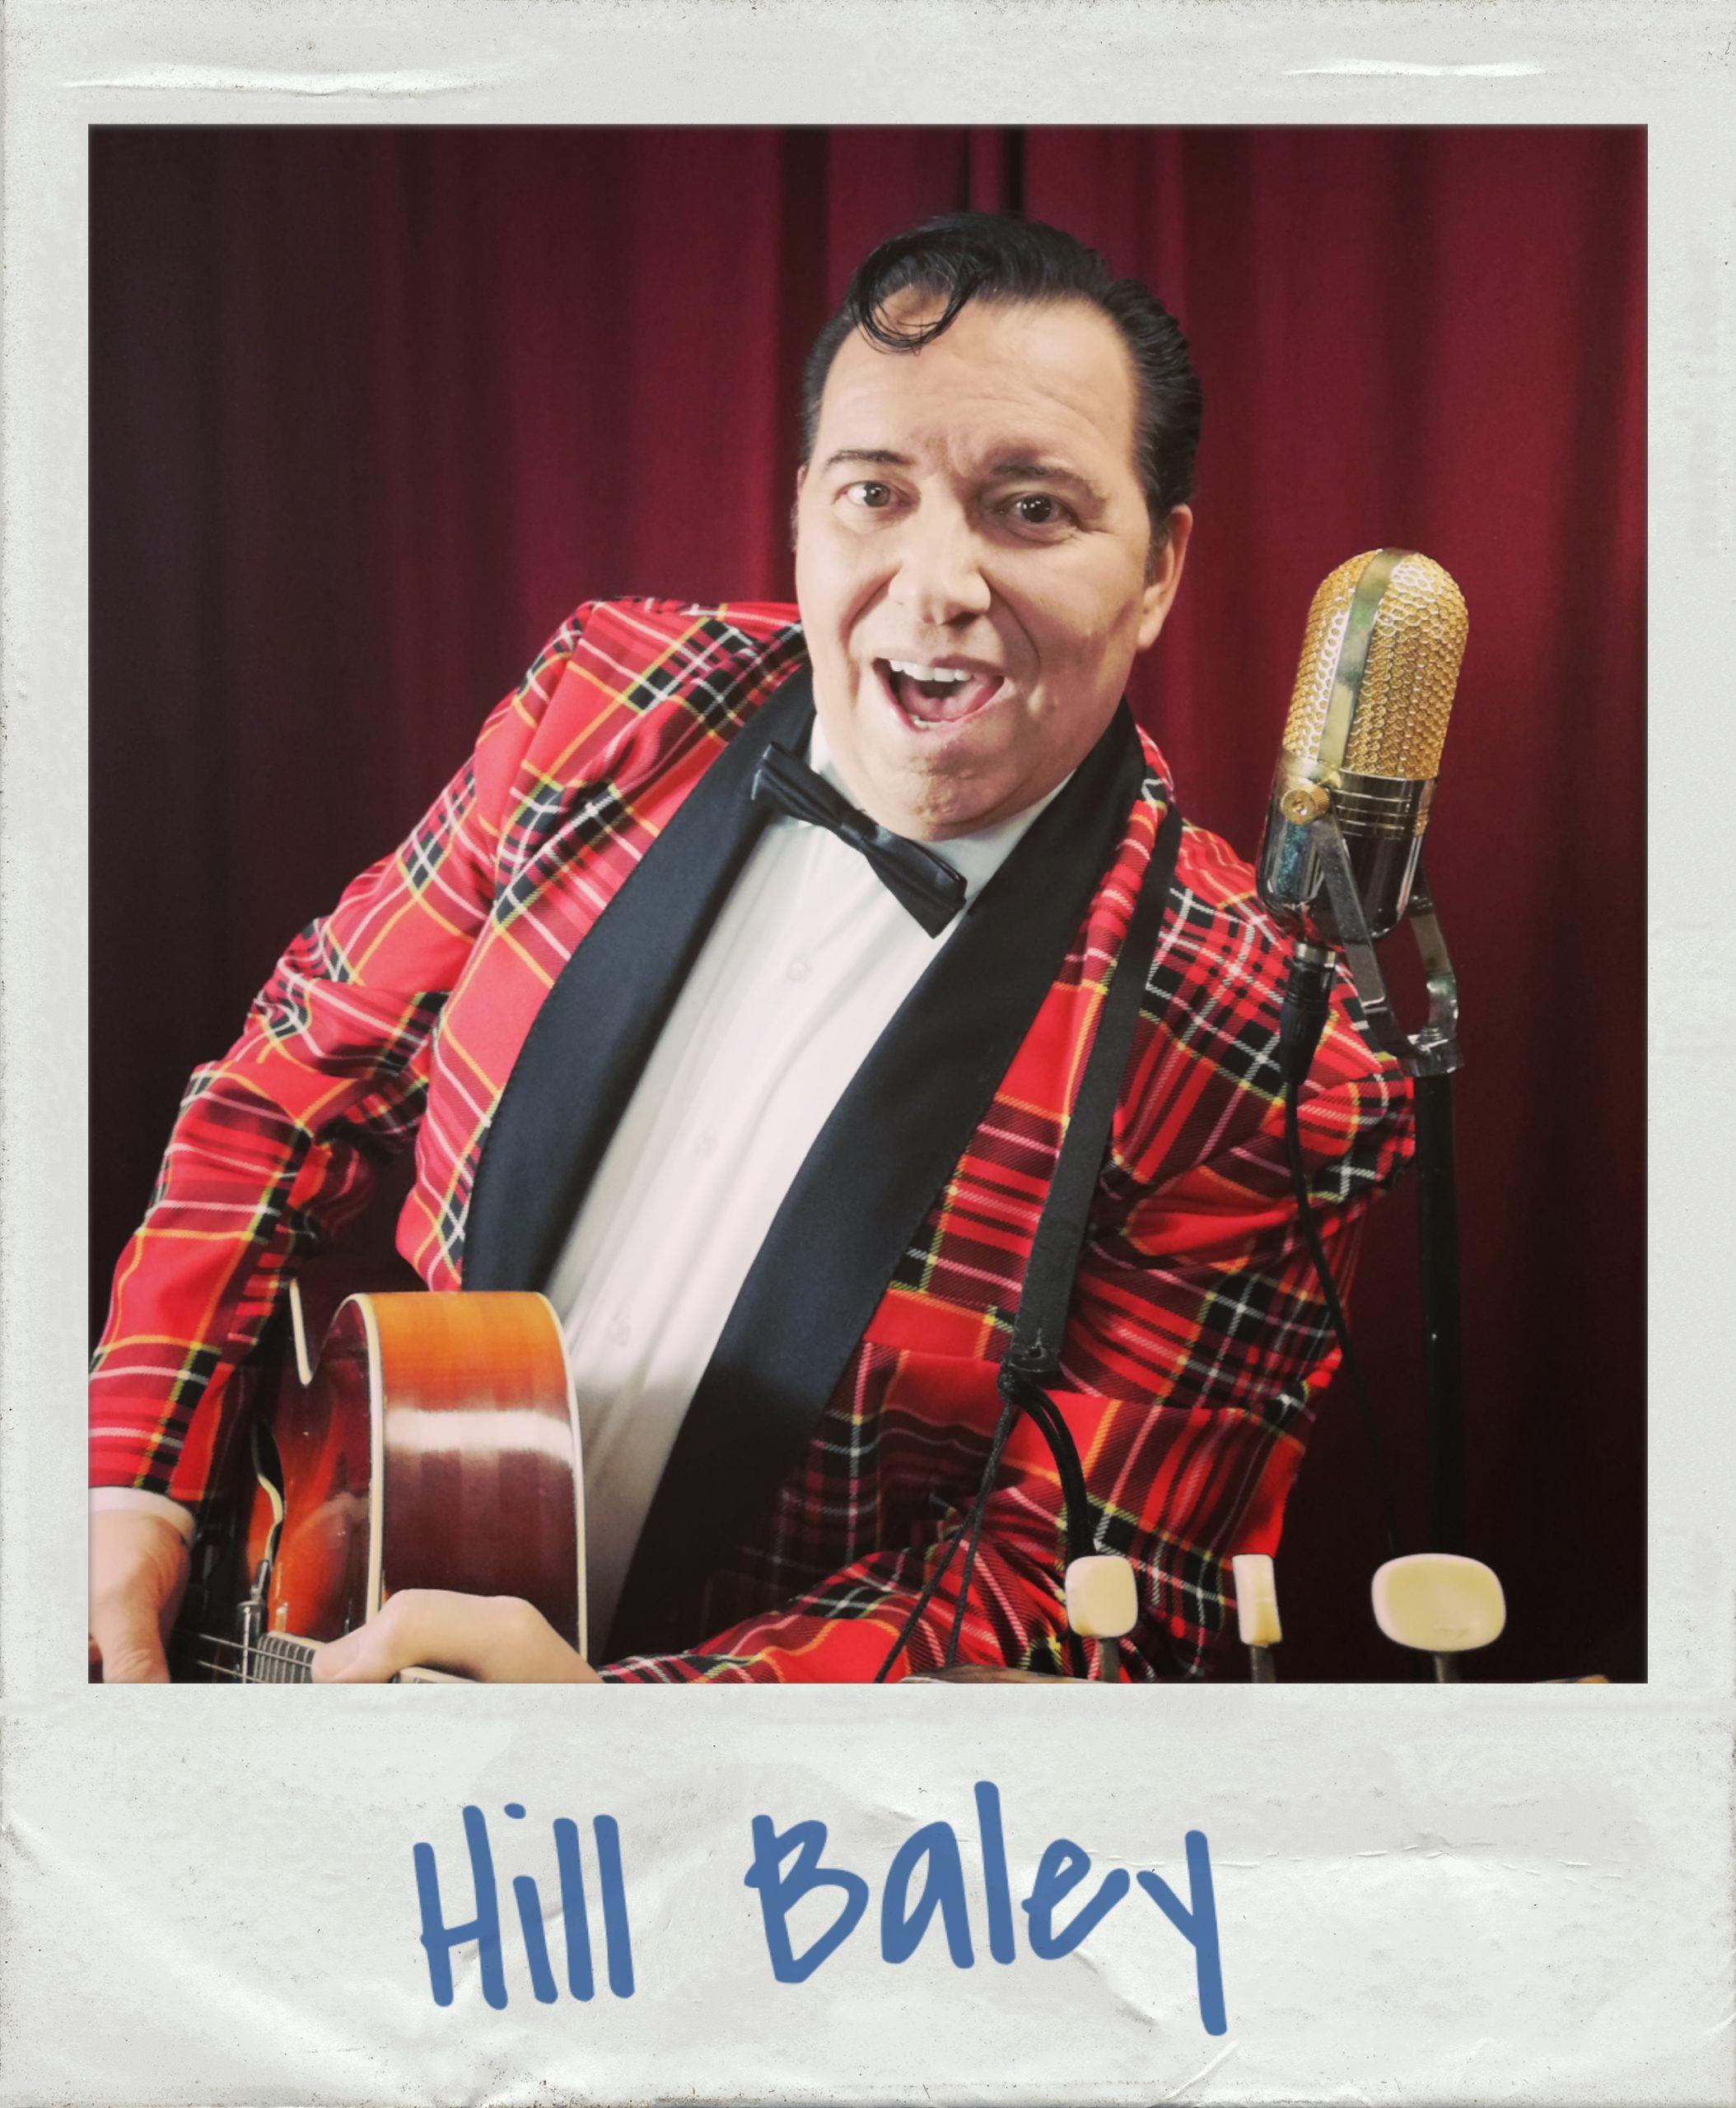 Hill Baley - A Rock N Roll Tribute to Bill Haley